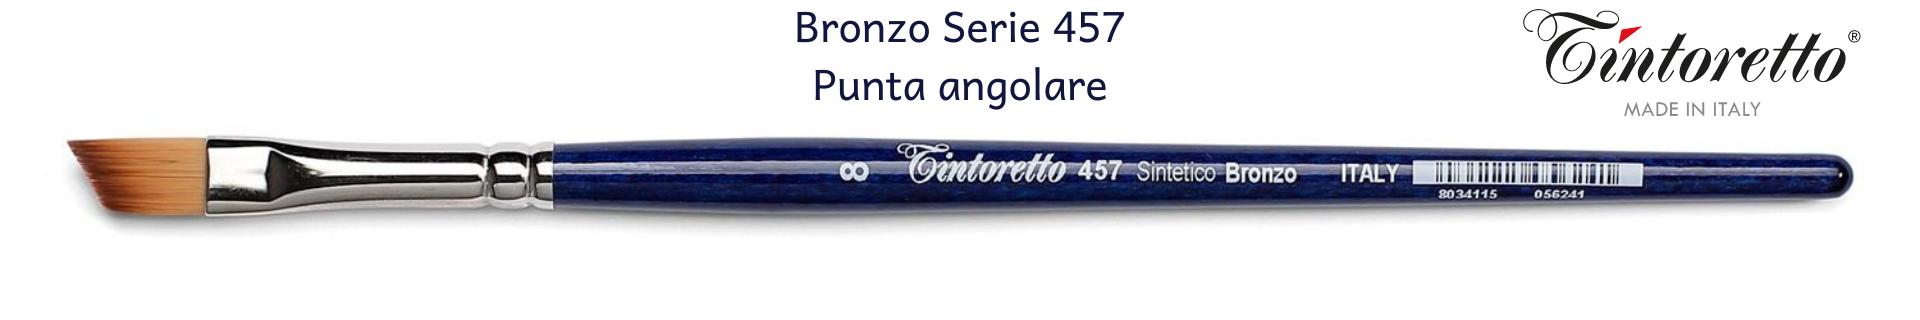 Tintoretto Bronzo 457